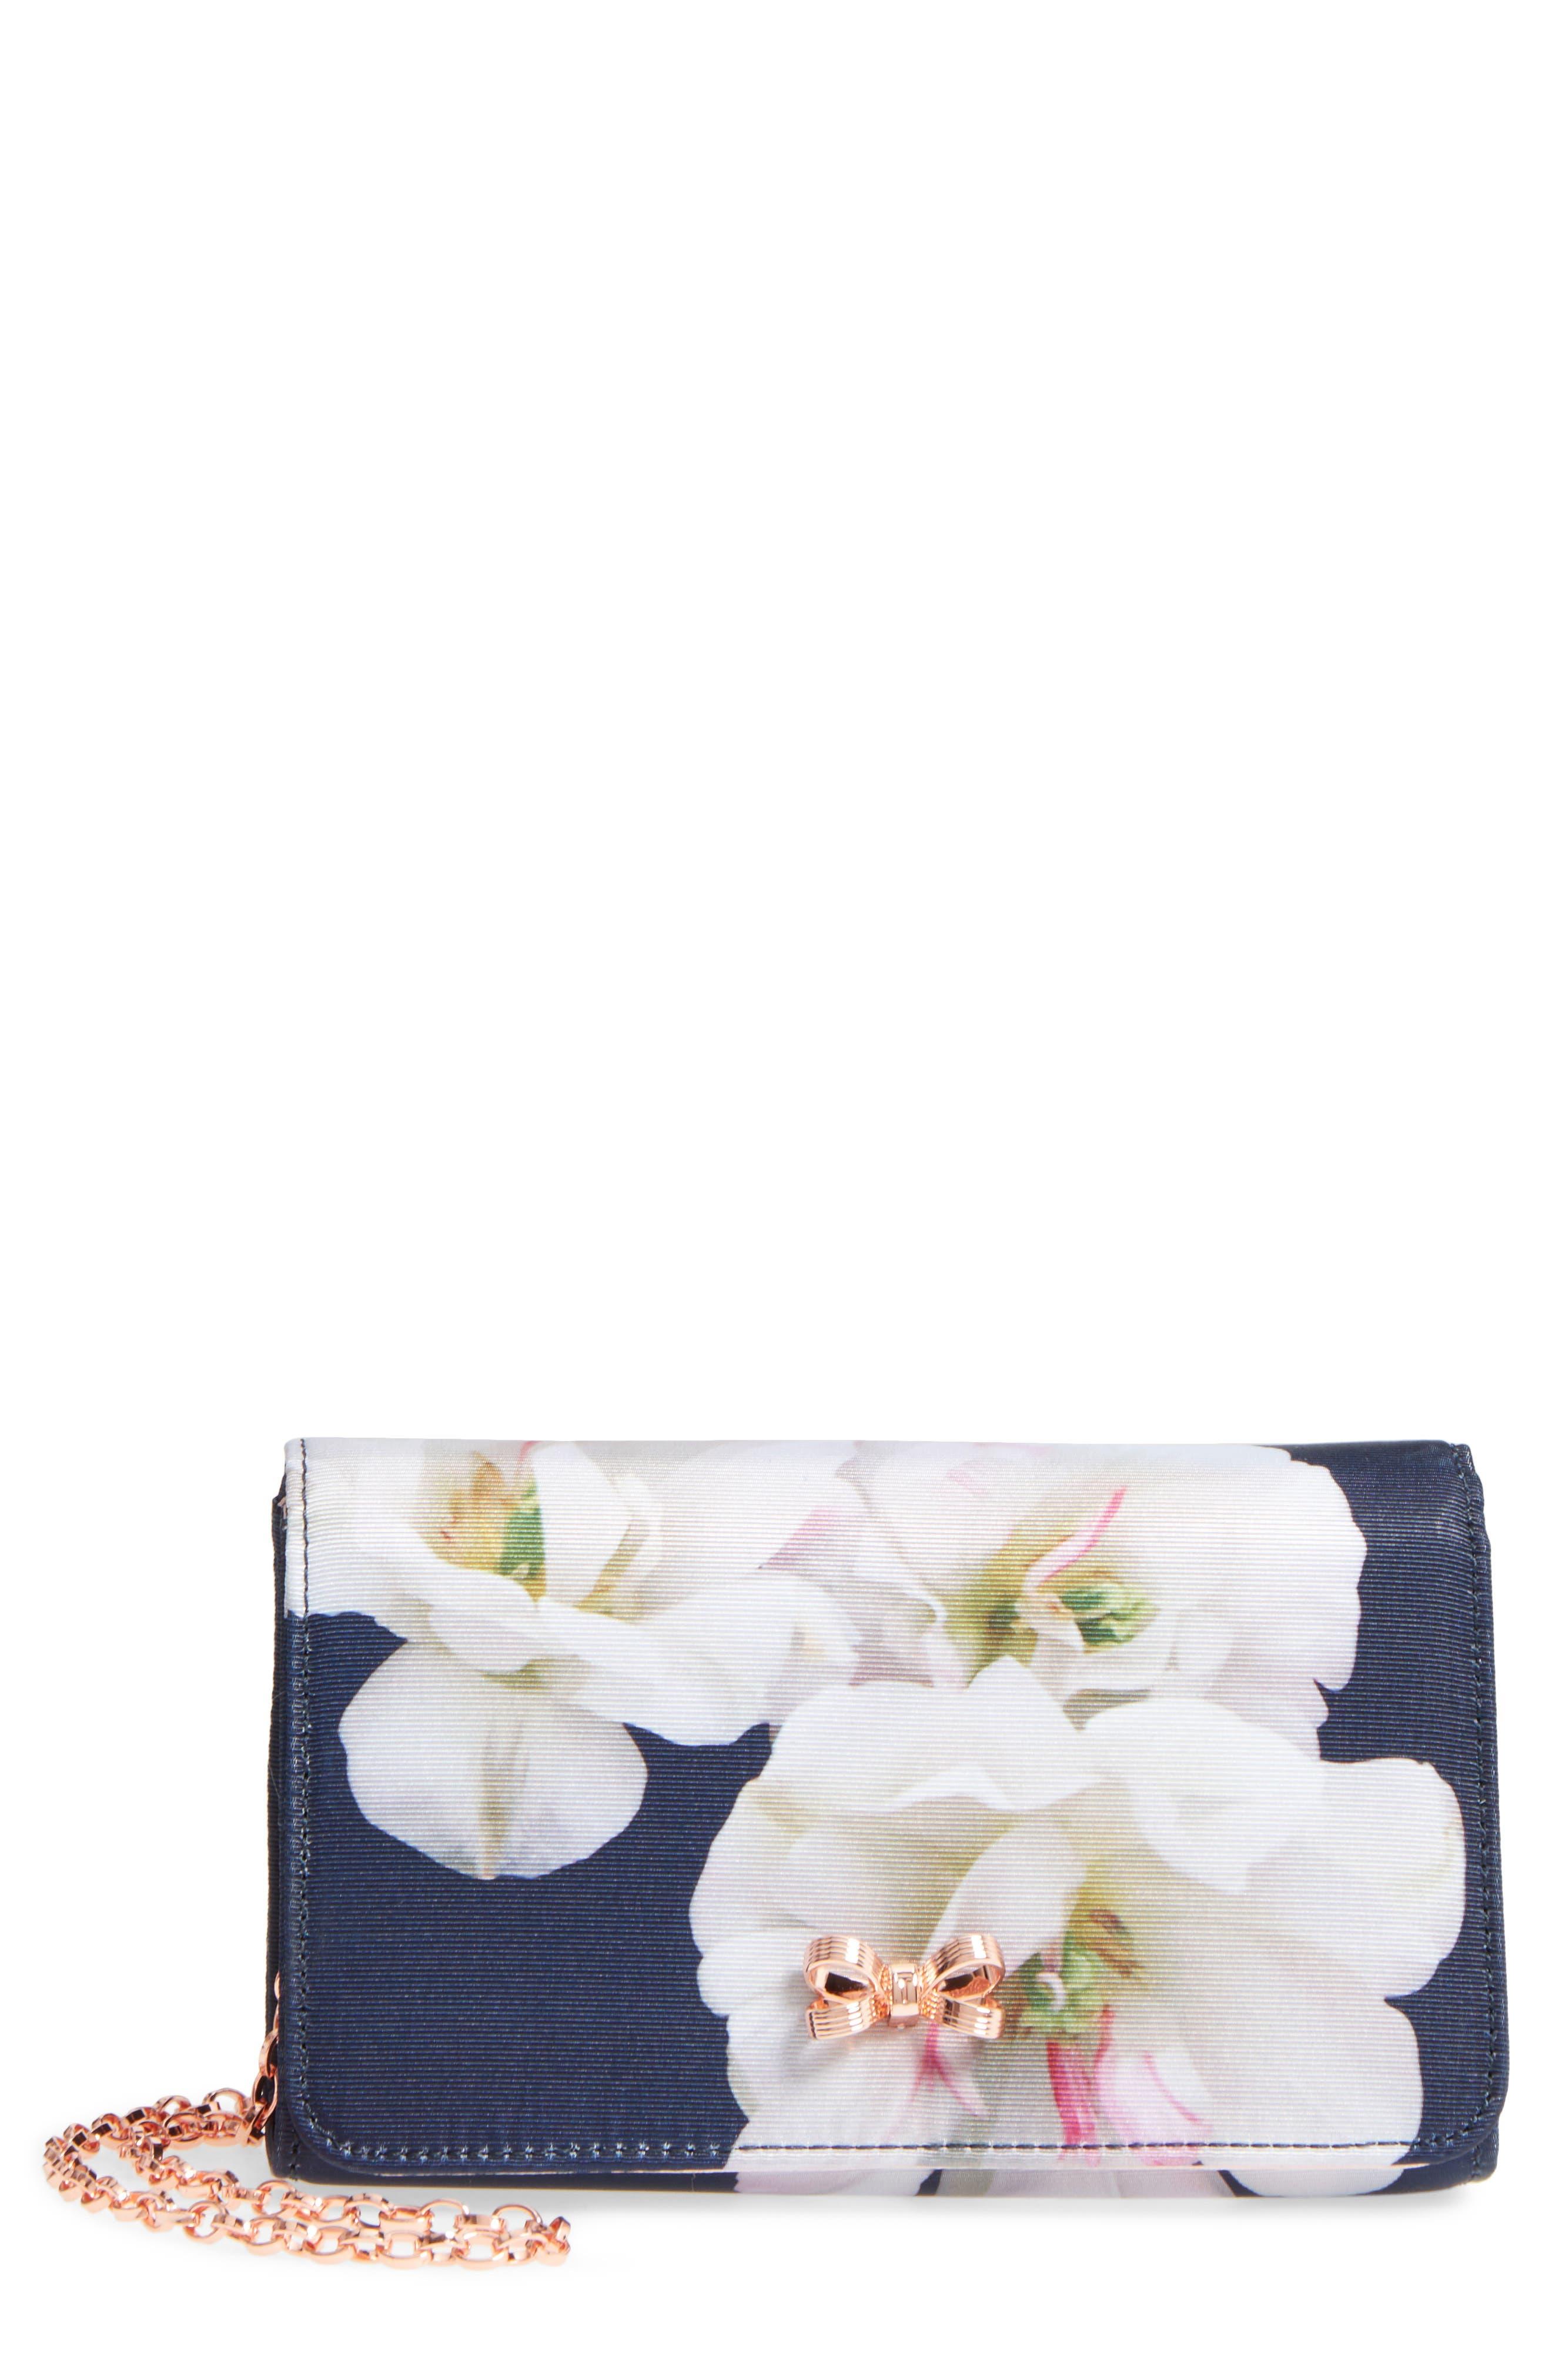 Dafodil Gardenia Grosgrain Clutch,                         Main,                         color, 402